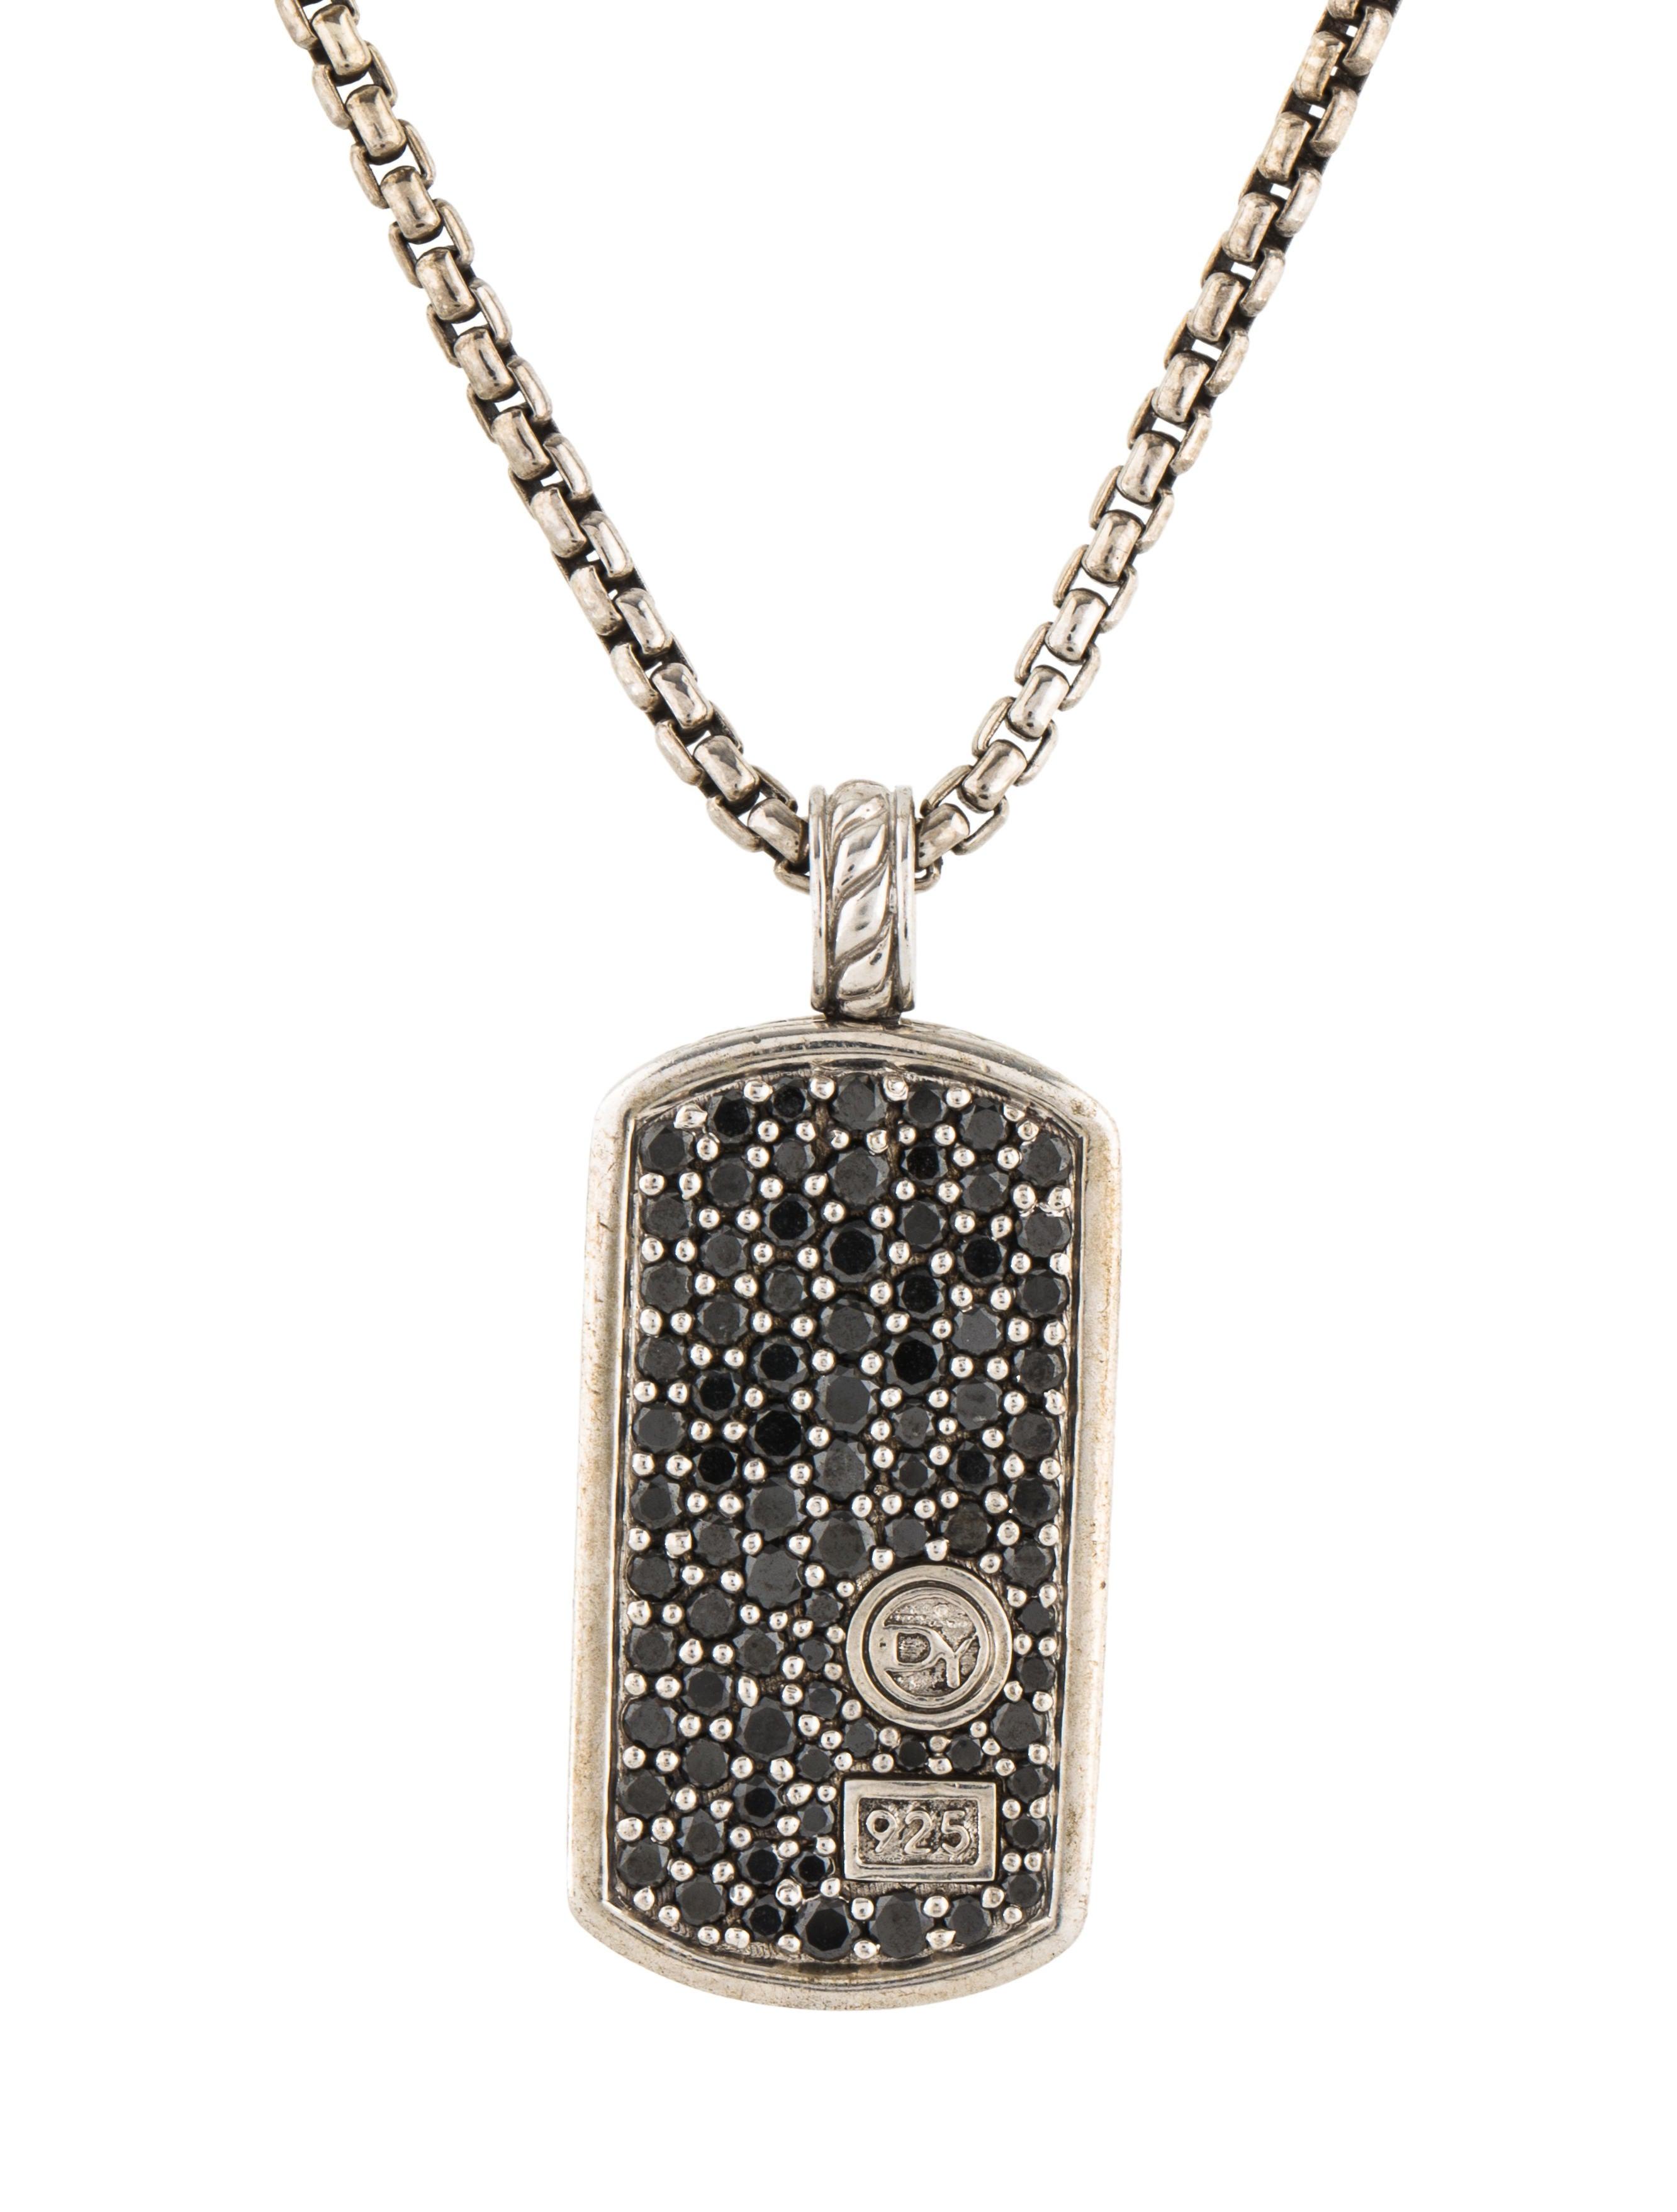 David yurman diamond dog tag pendant necklace necklaces dvy48217 diamond dog tag pendant necklace mozeypictures Images